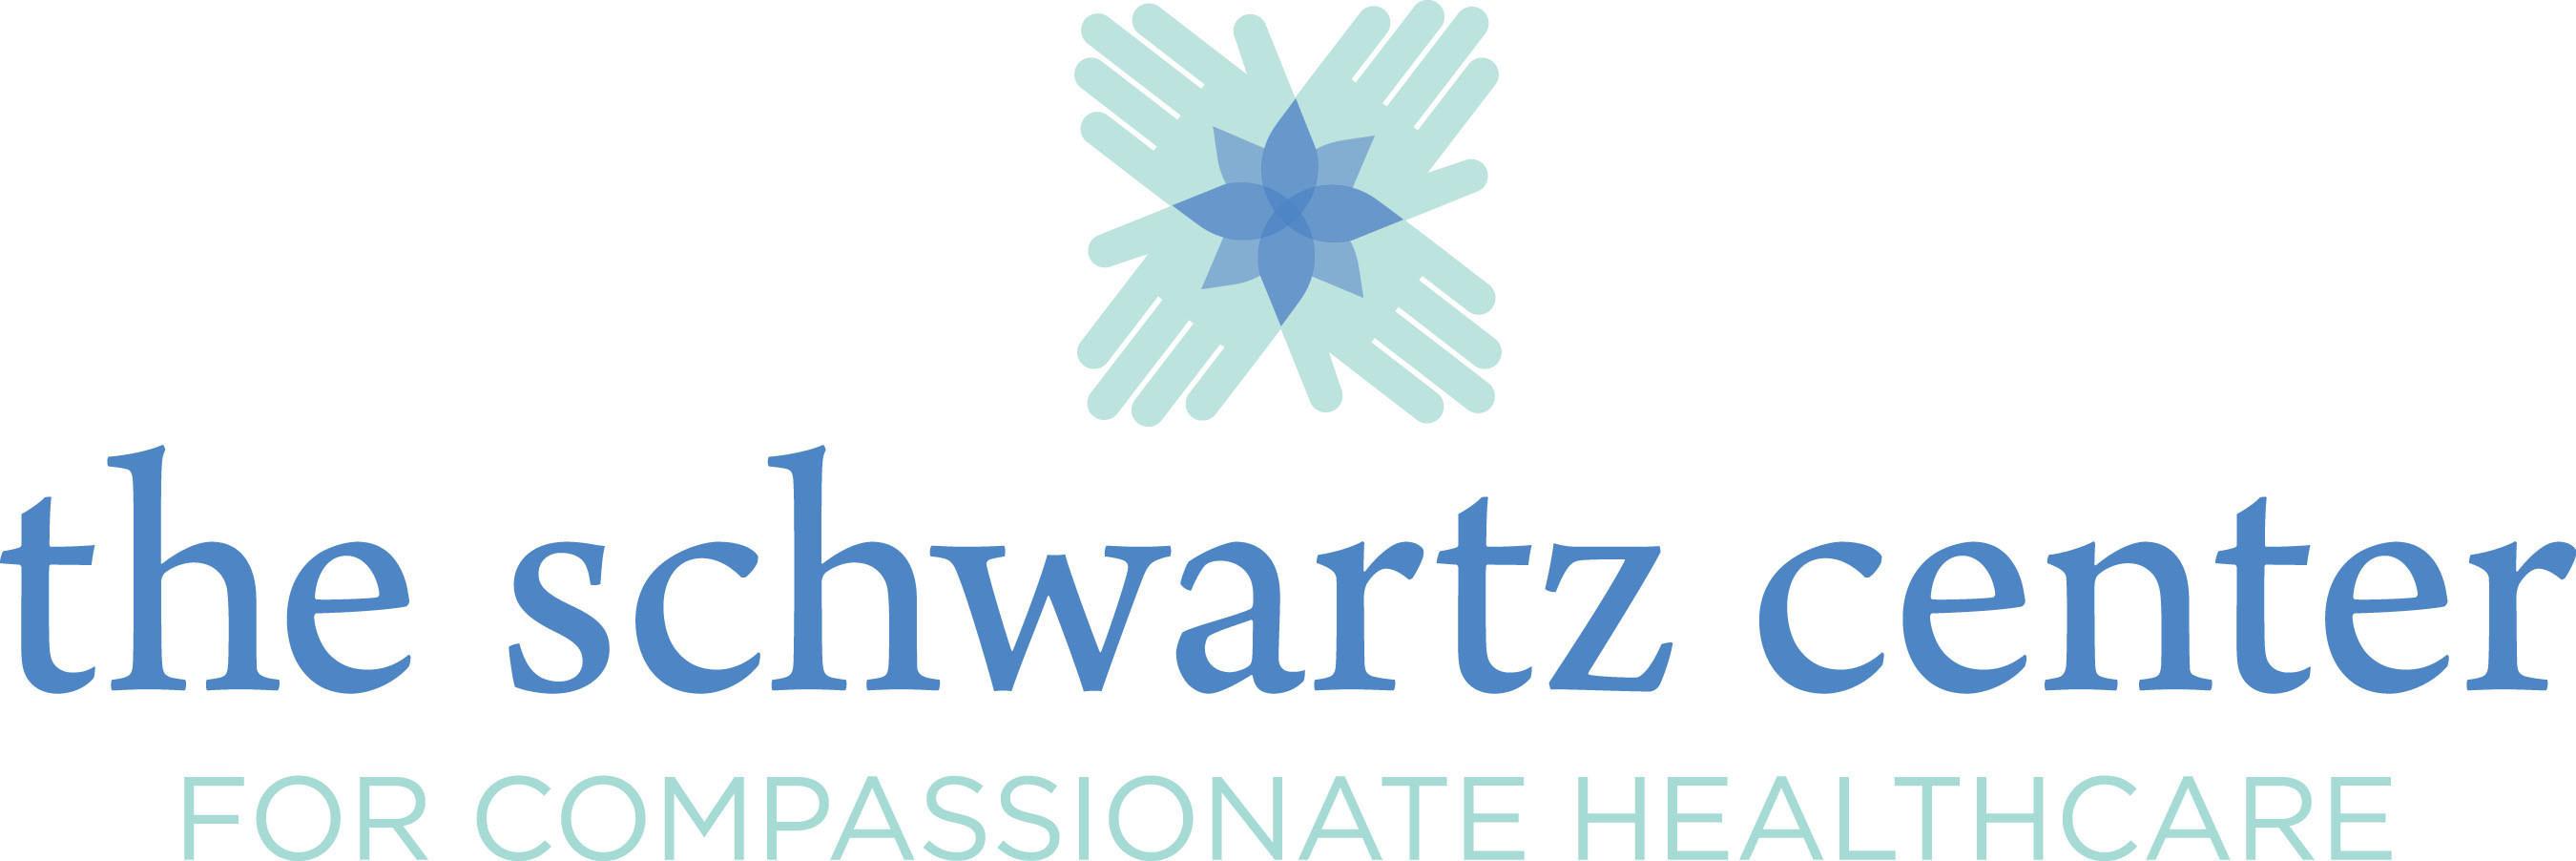 The Schwartz Center for Compassionate Healthcare